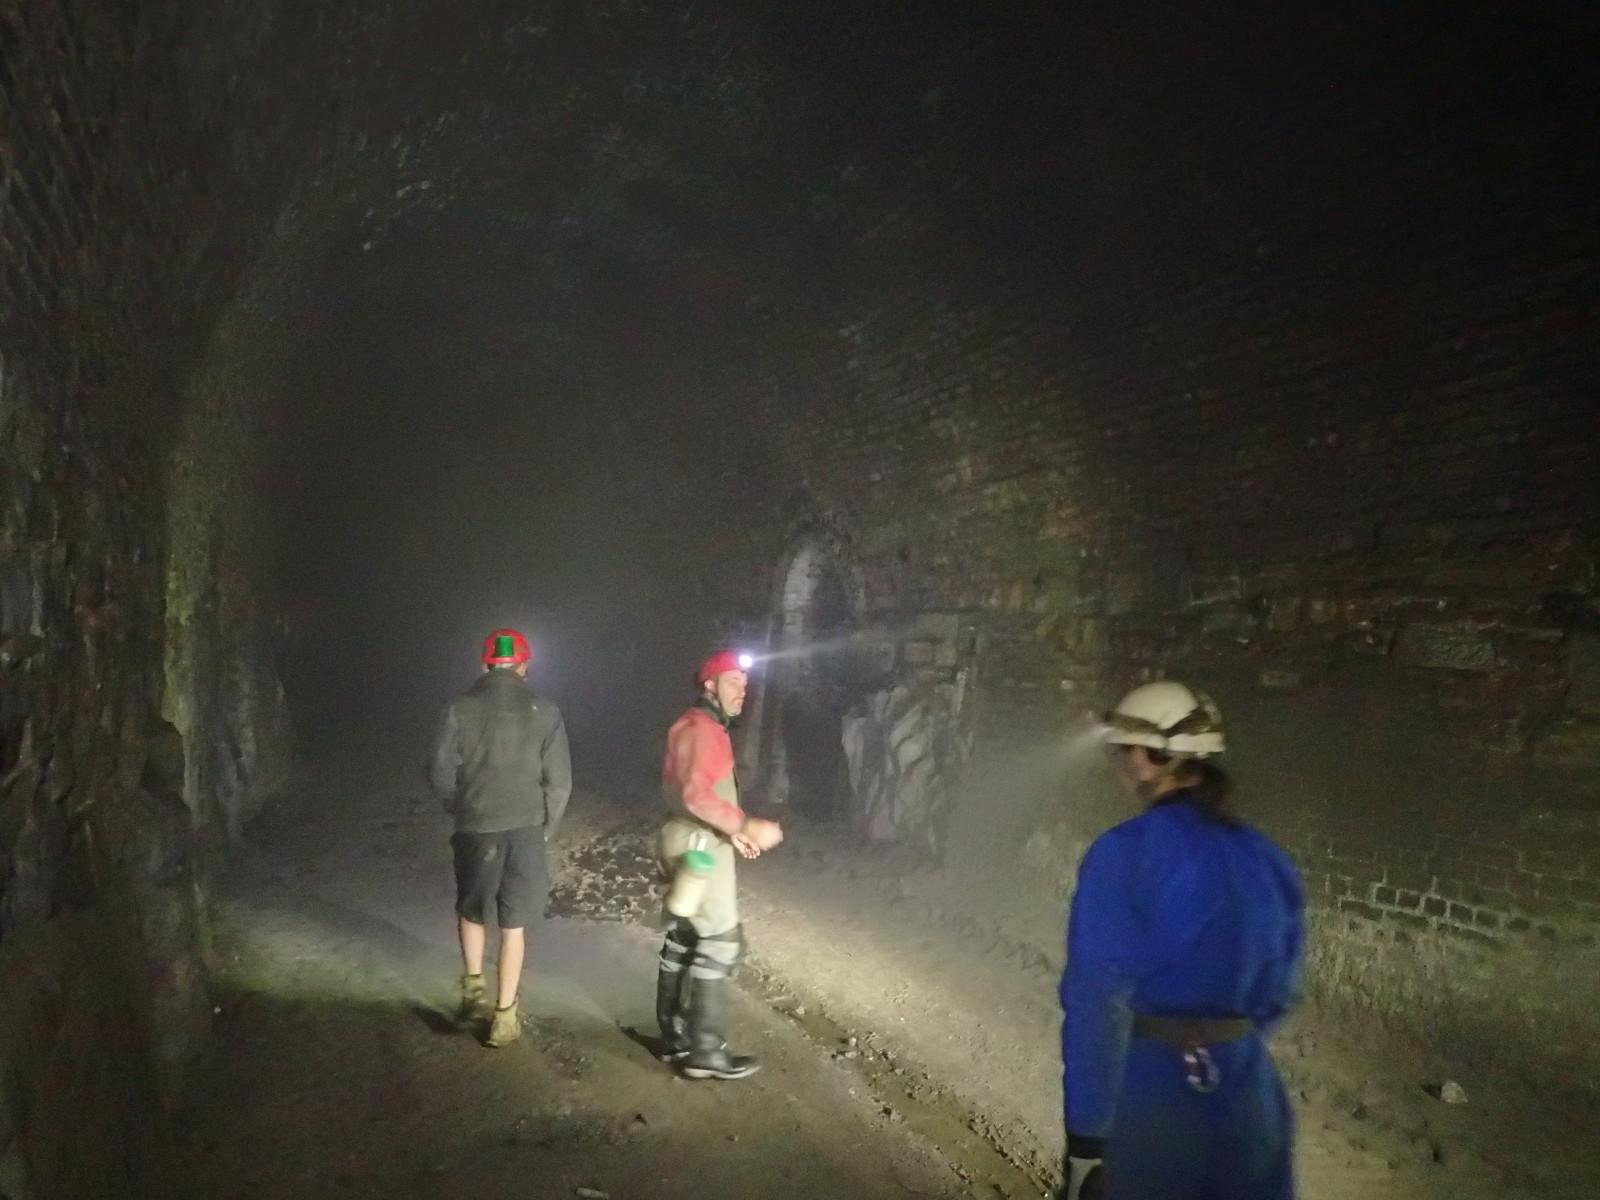 Start of tunnel was misty